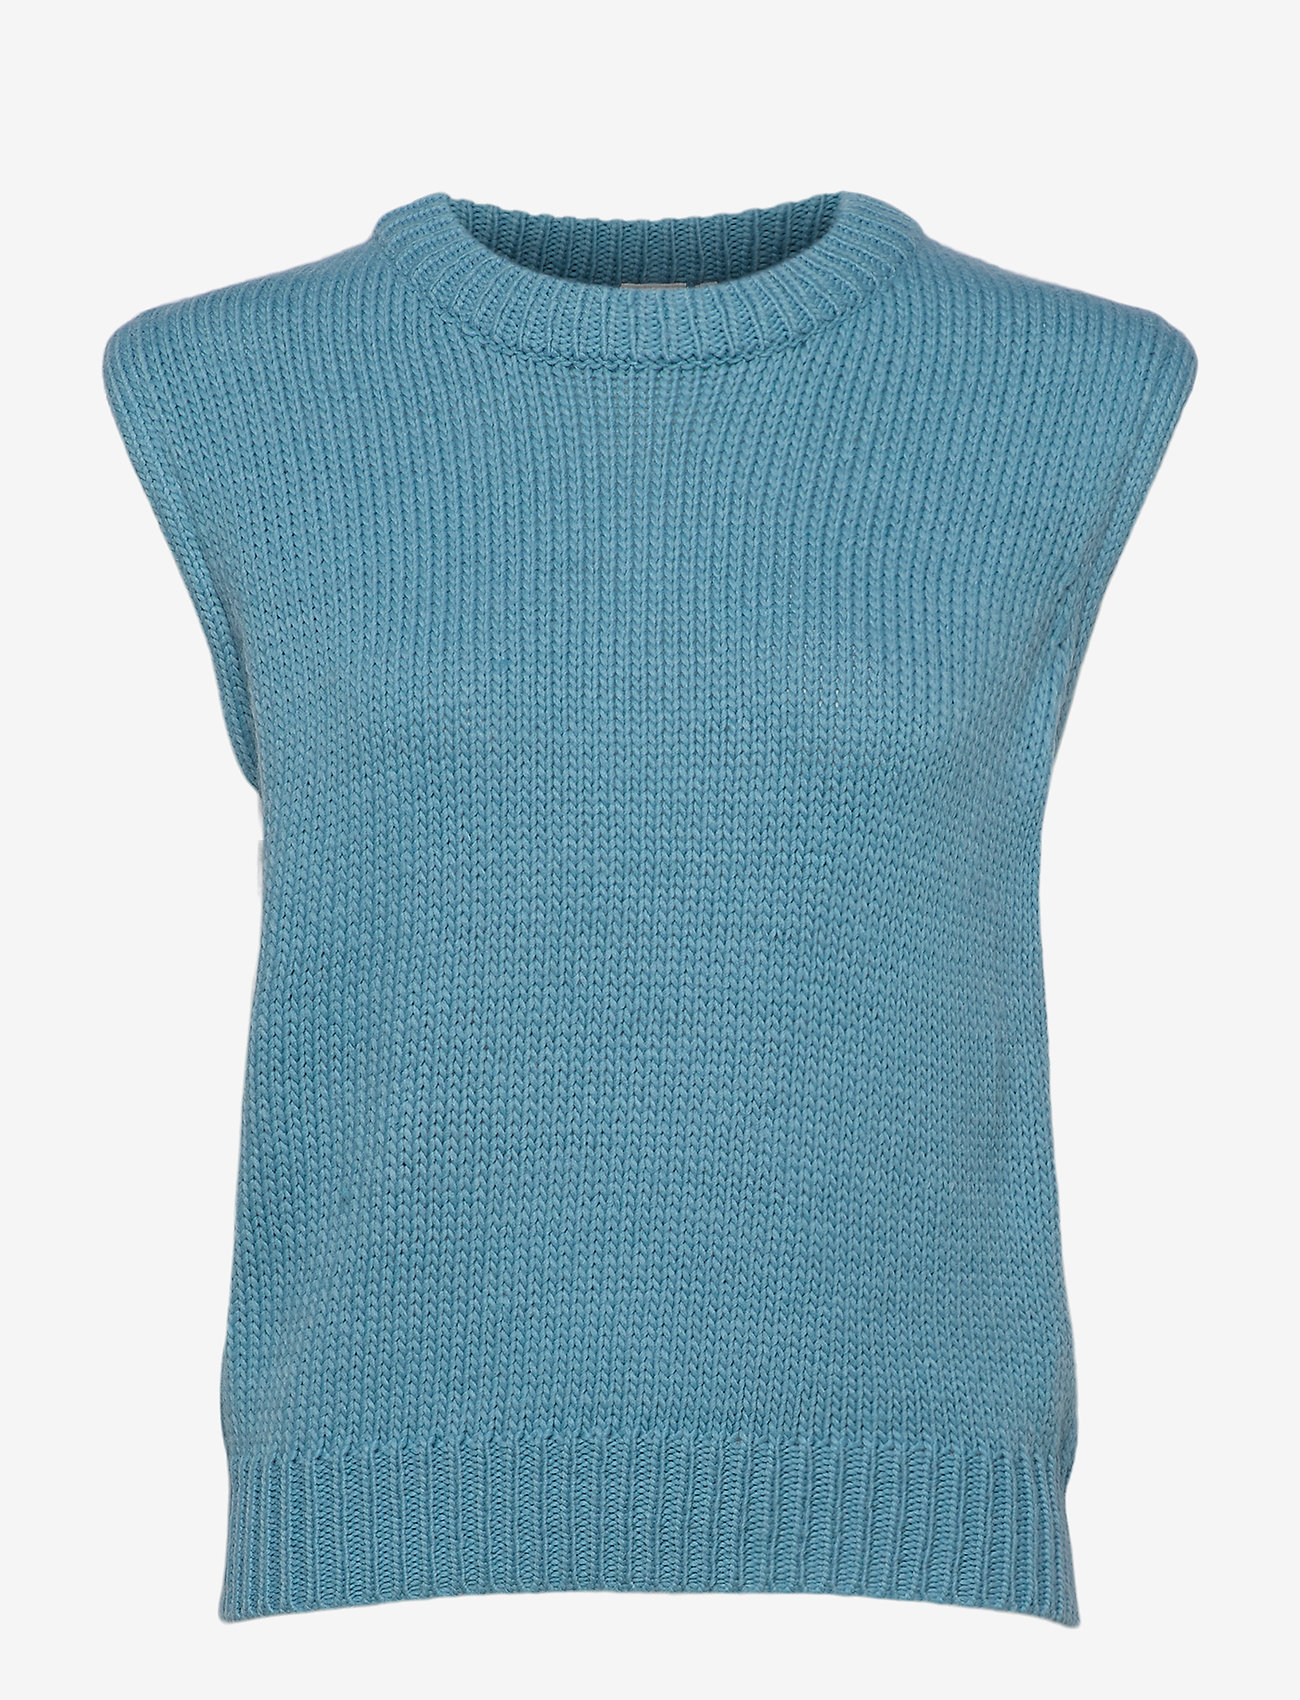 ICHI - IHMILLI WA - knitted vests - delphinium blue - 0